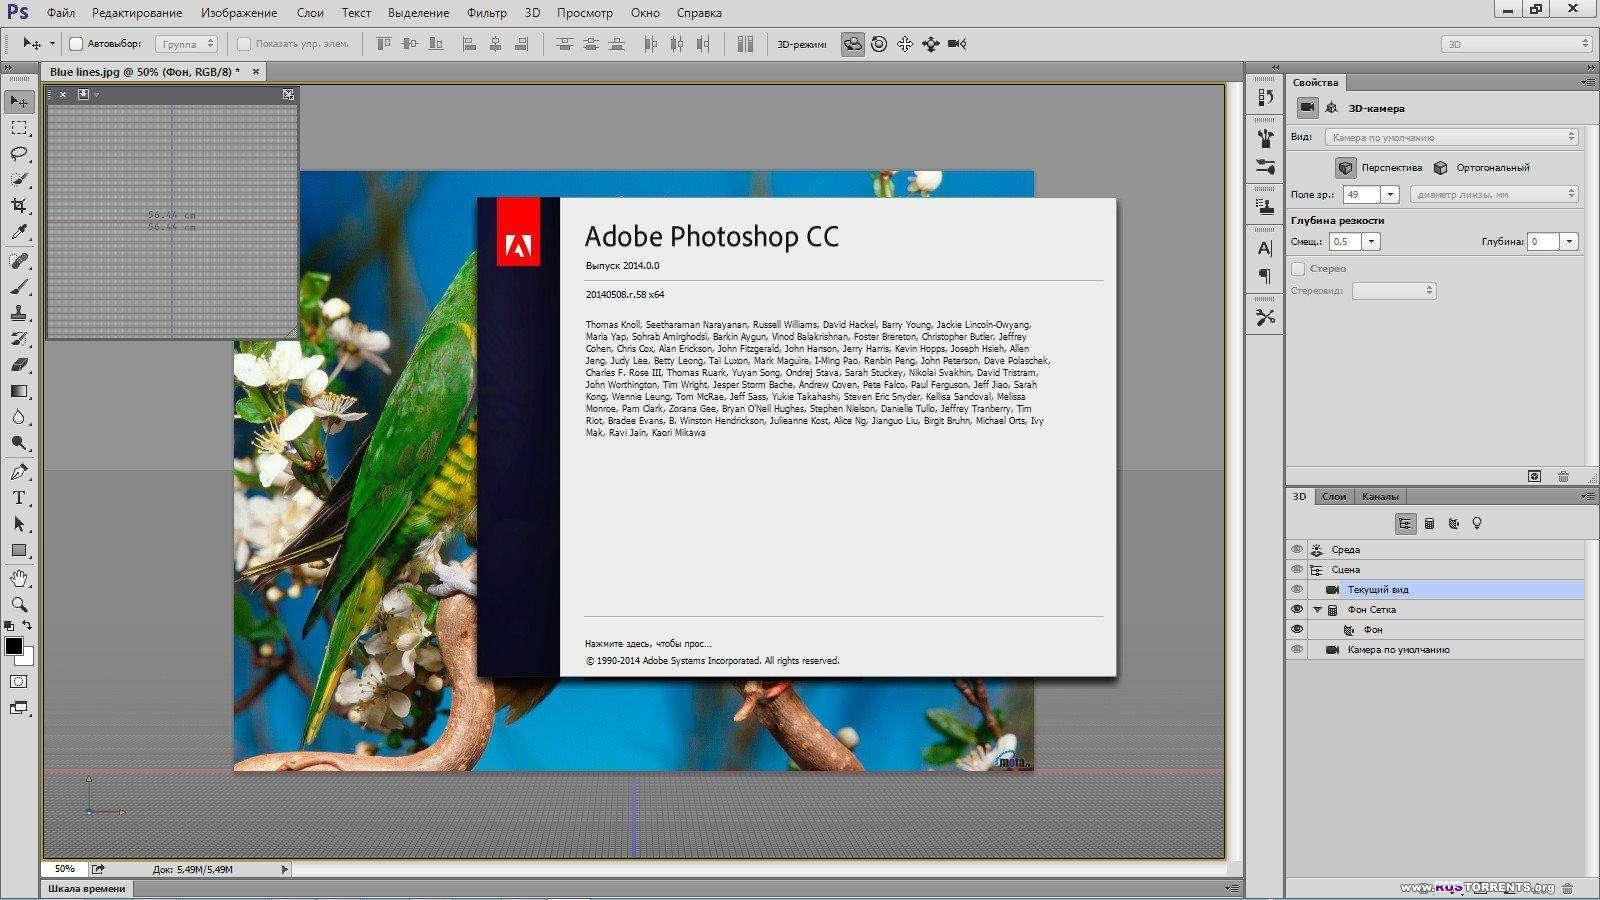 Adobe Photoshop CC 2014 | PC | RePack by D!akov